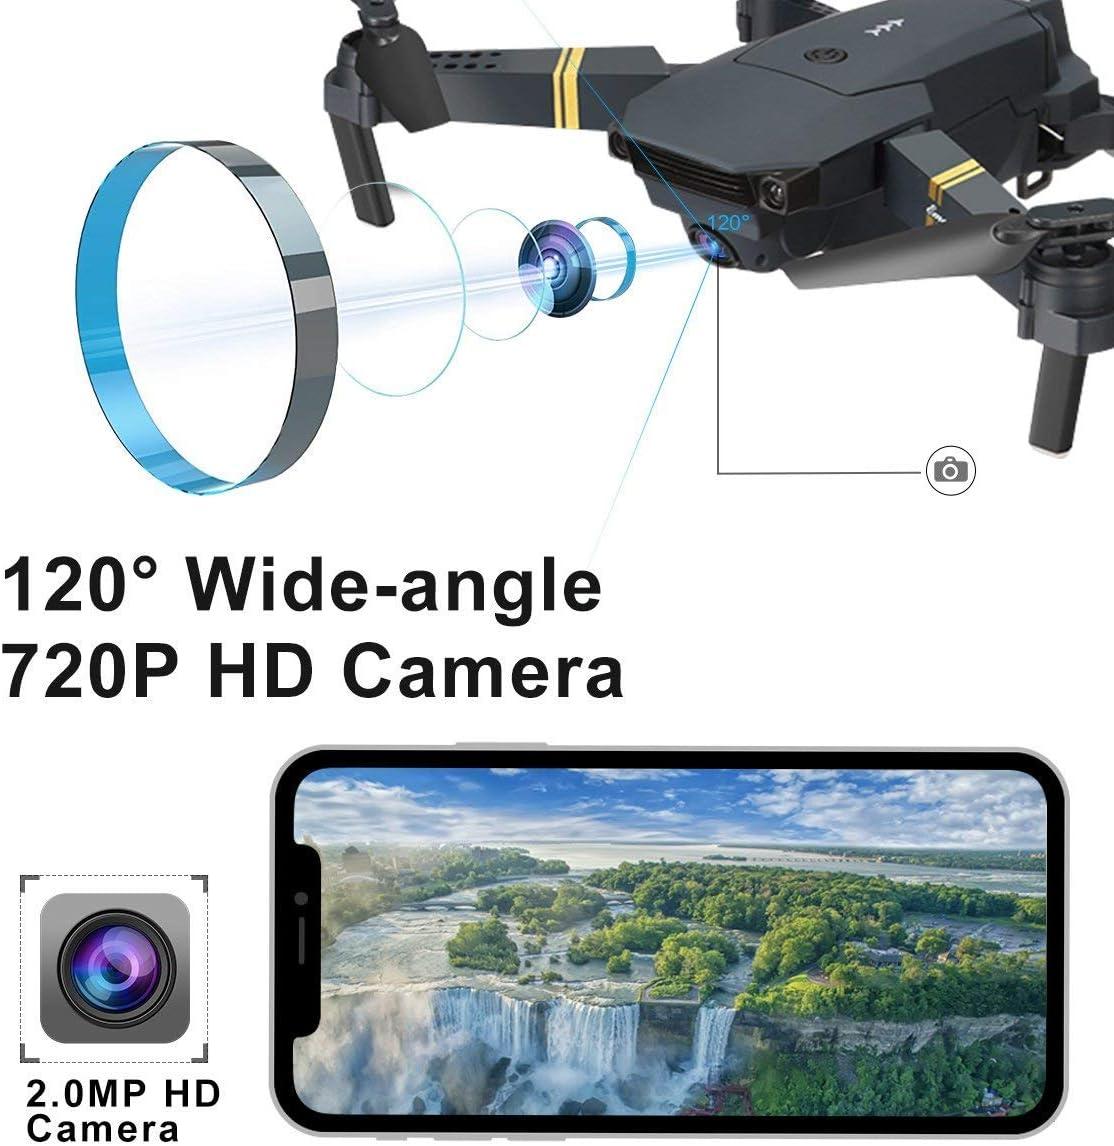 Eachine E58 drone review of FPV Wi-fi HD Camera